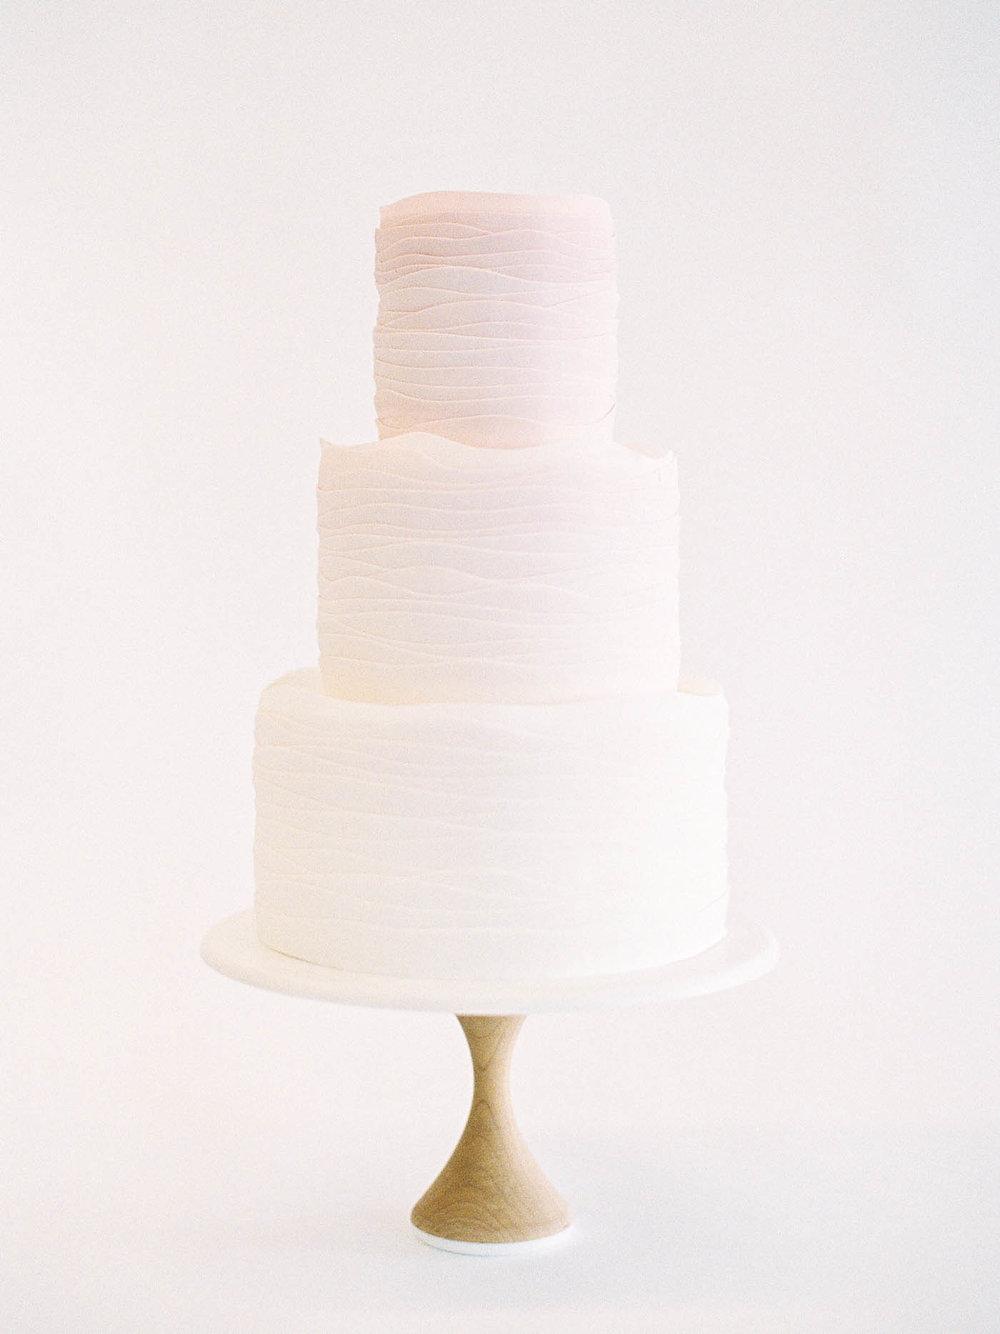 Delicate-Wedding-Cakes-3-Jen_Huang-002344-R1-003.jpg